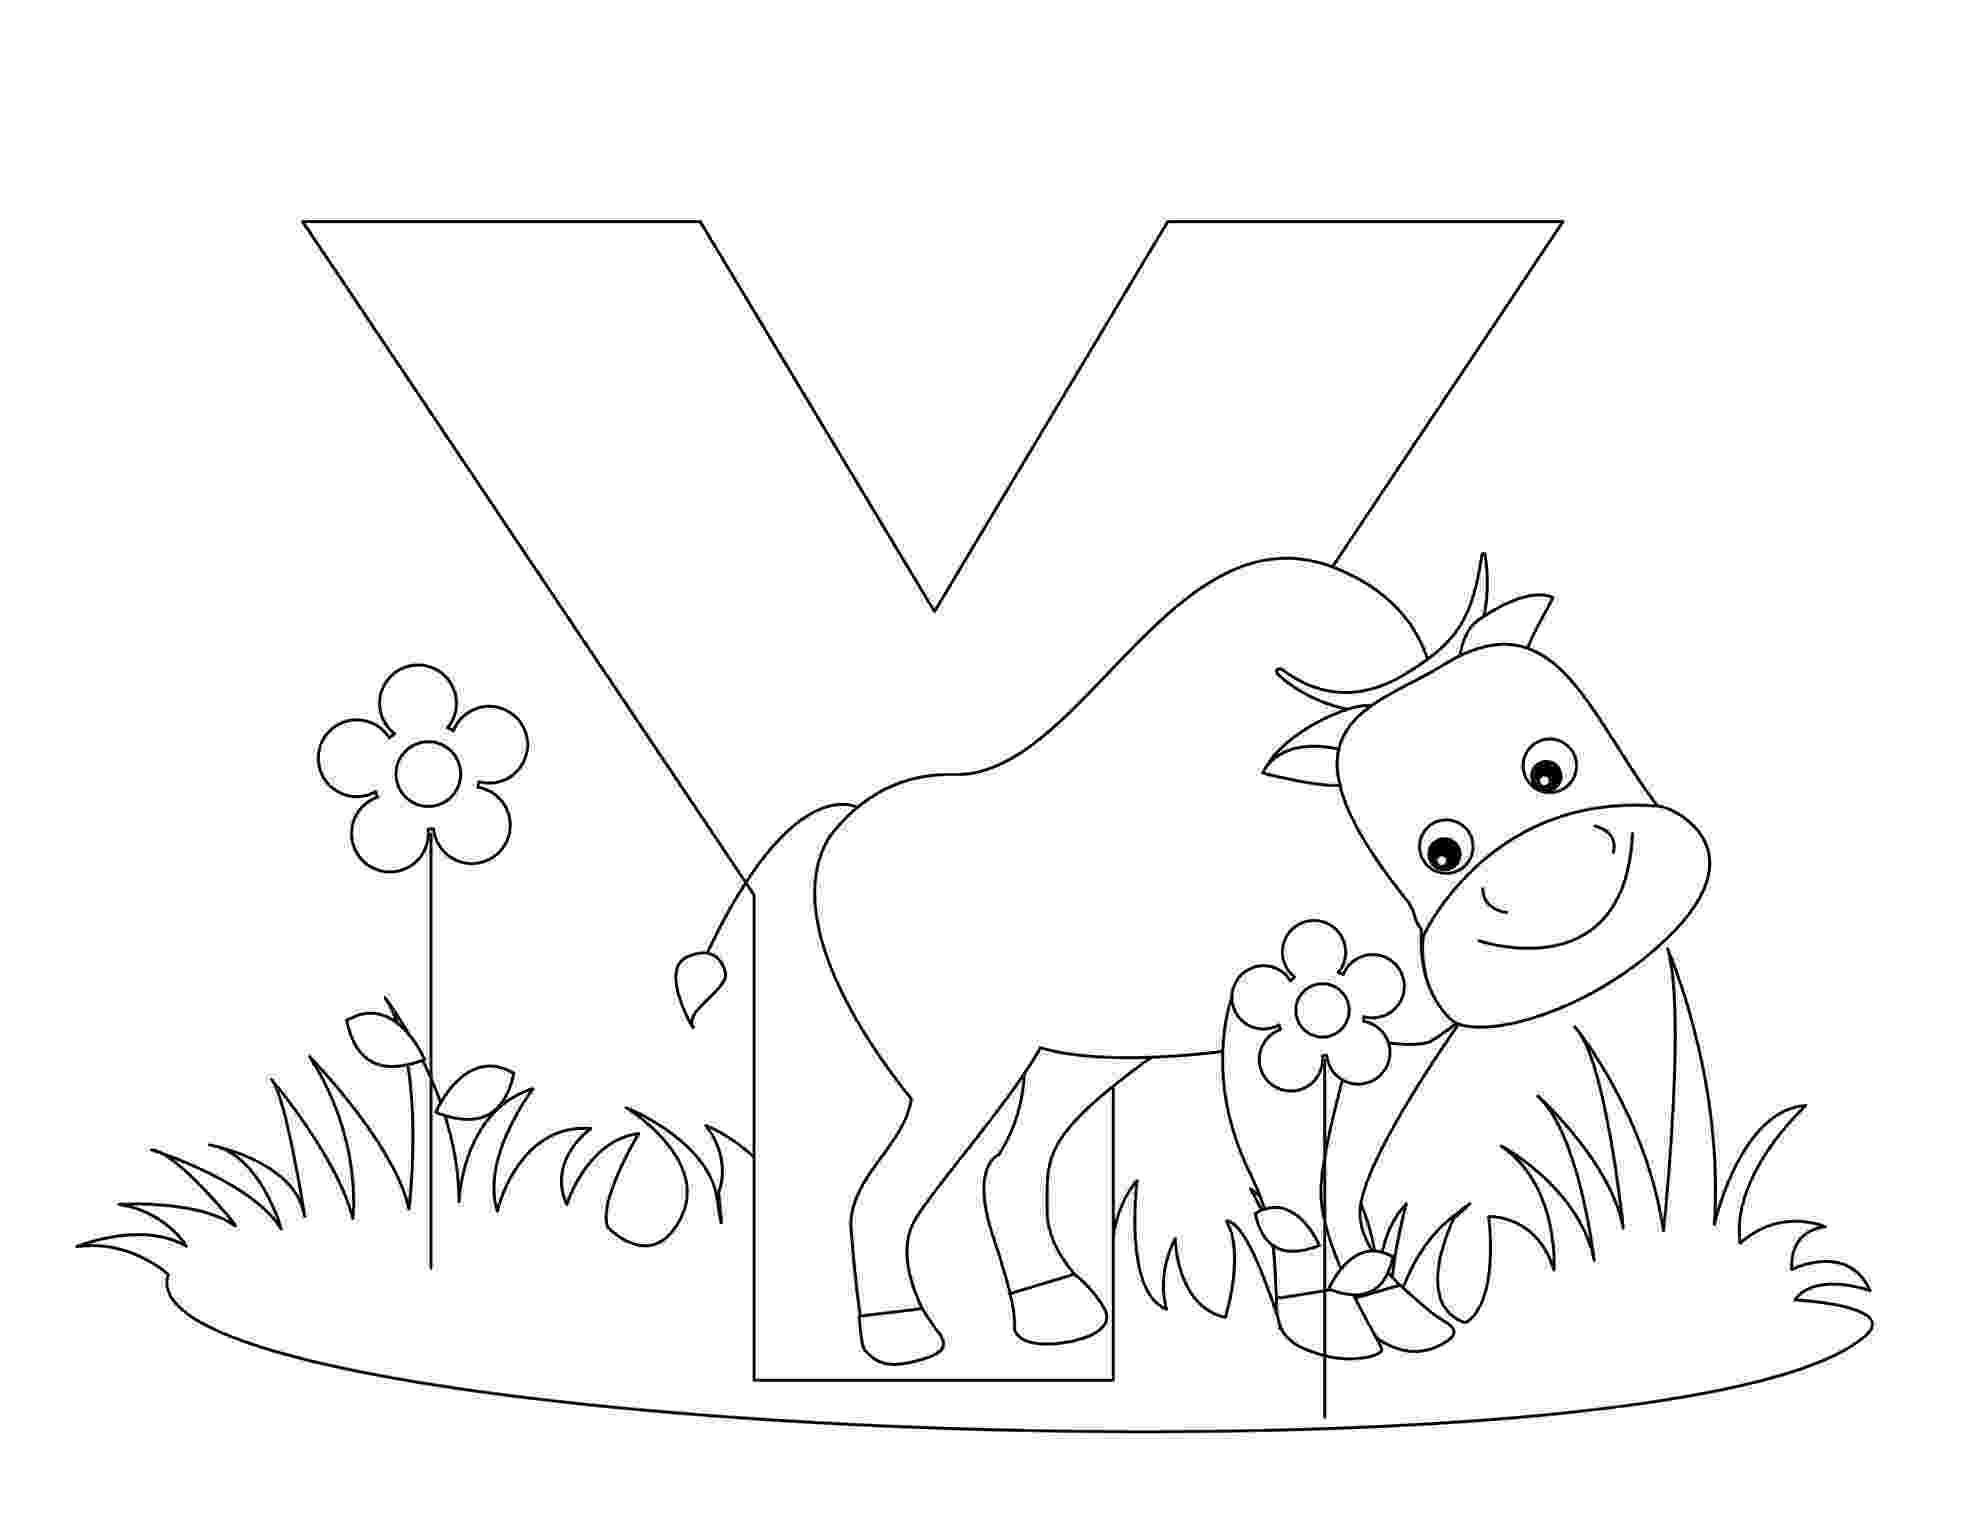 abc coloring sheets free printable alphabet coloring pages for kids best abc sheets coloring 1 1